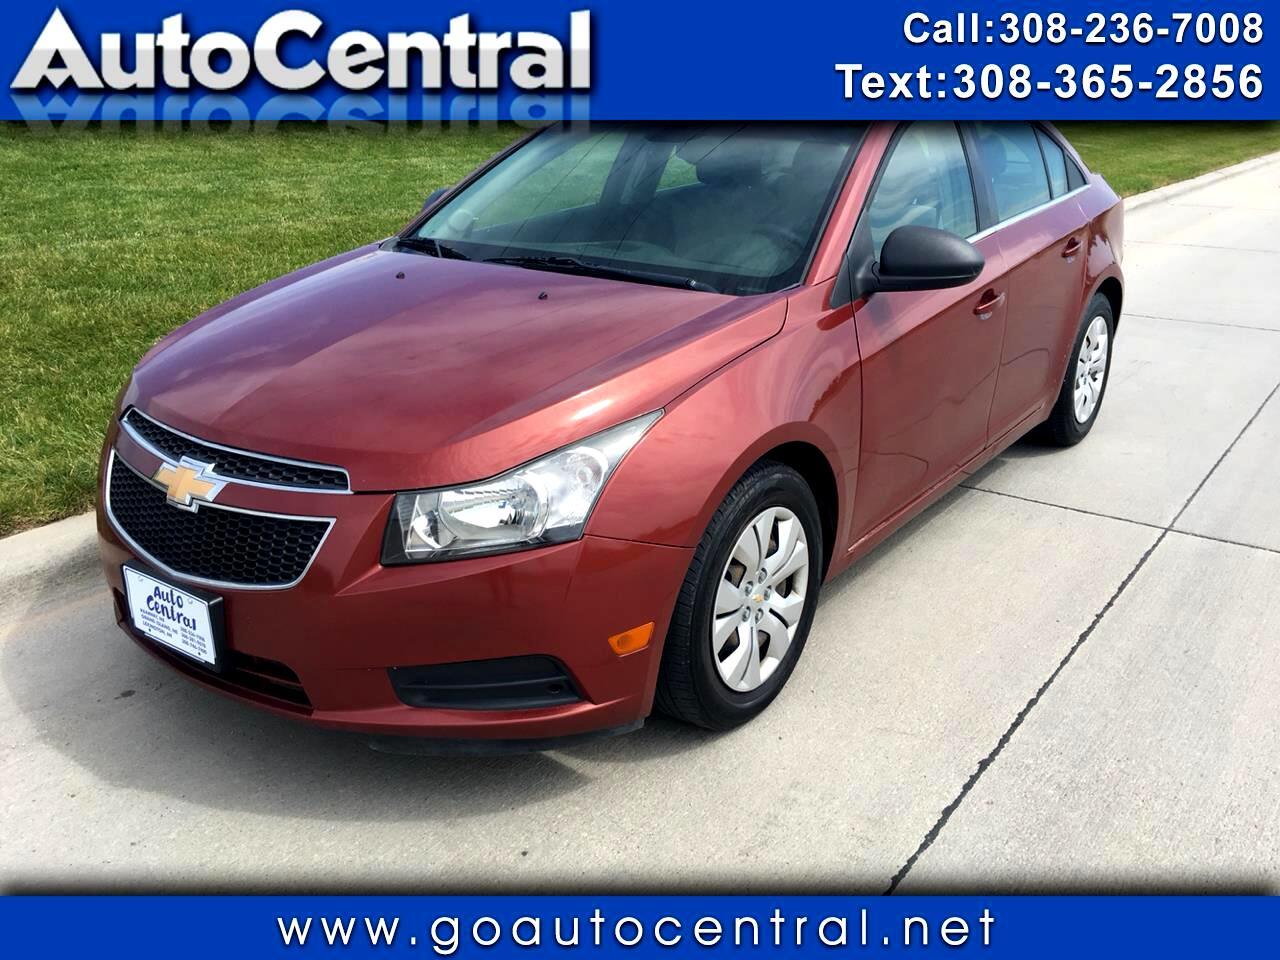 2012 Chevrolet Cruze 4dr Sdn LS